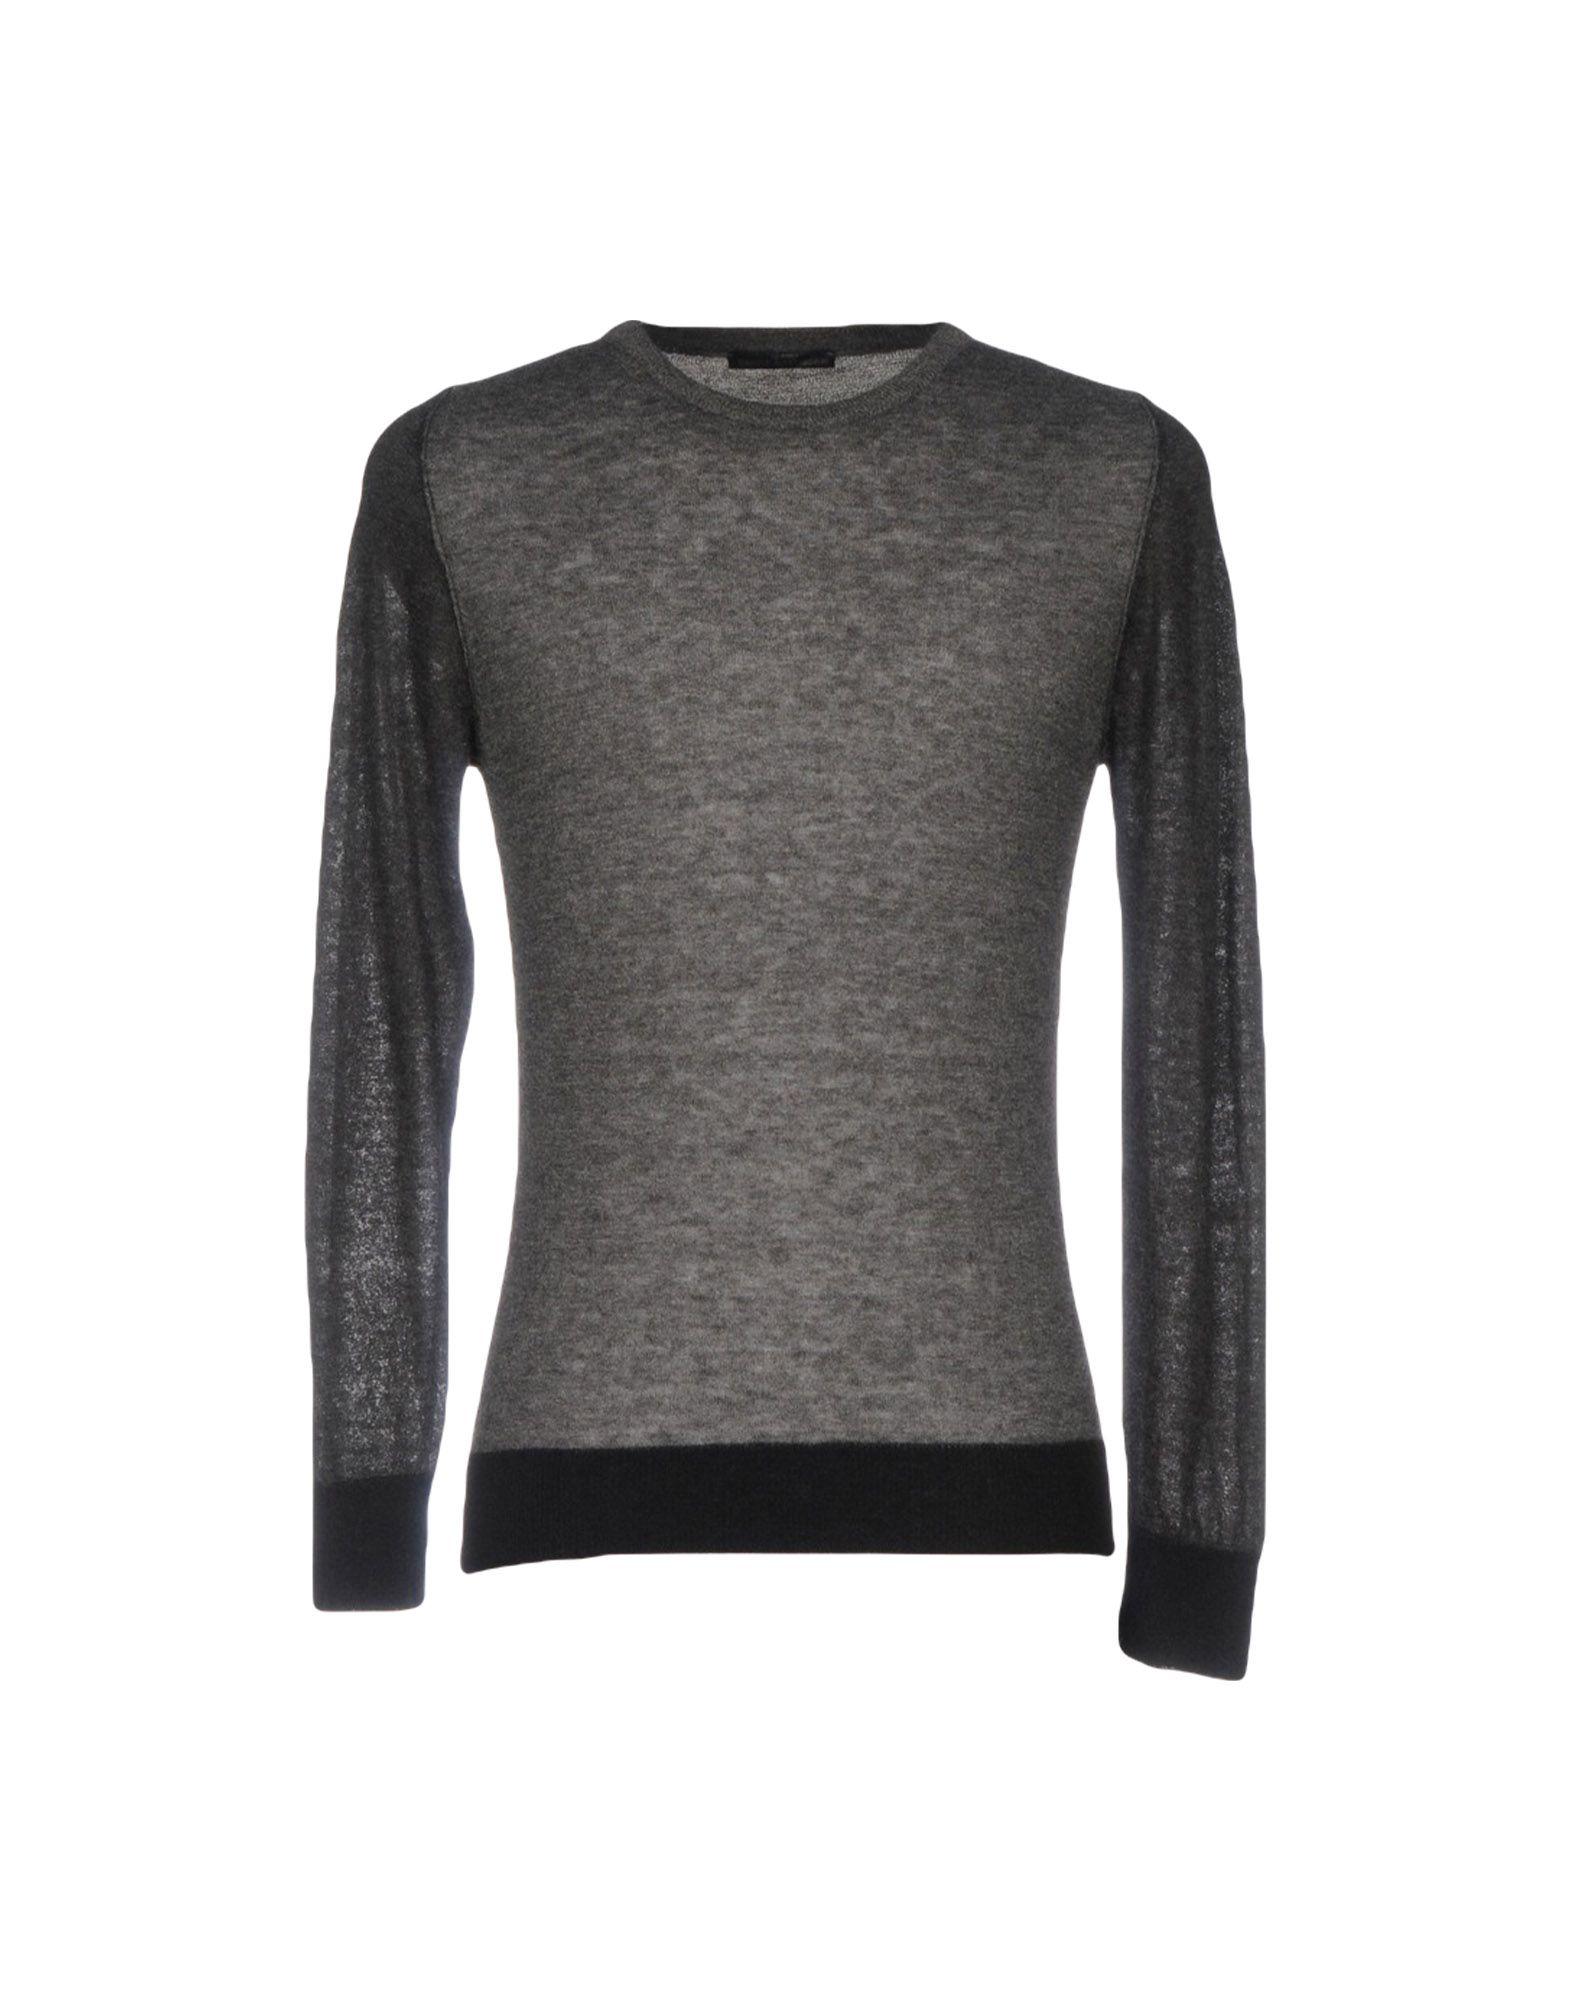 DANIELE ALESSANDRINI HOMME Herren Pullover Farbe Granitgrau Größe 2